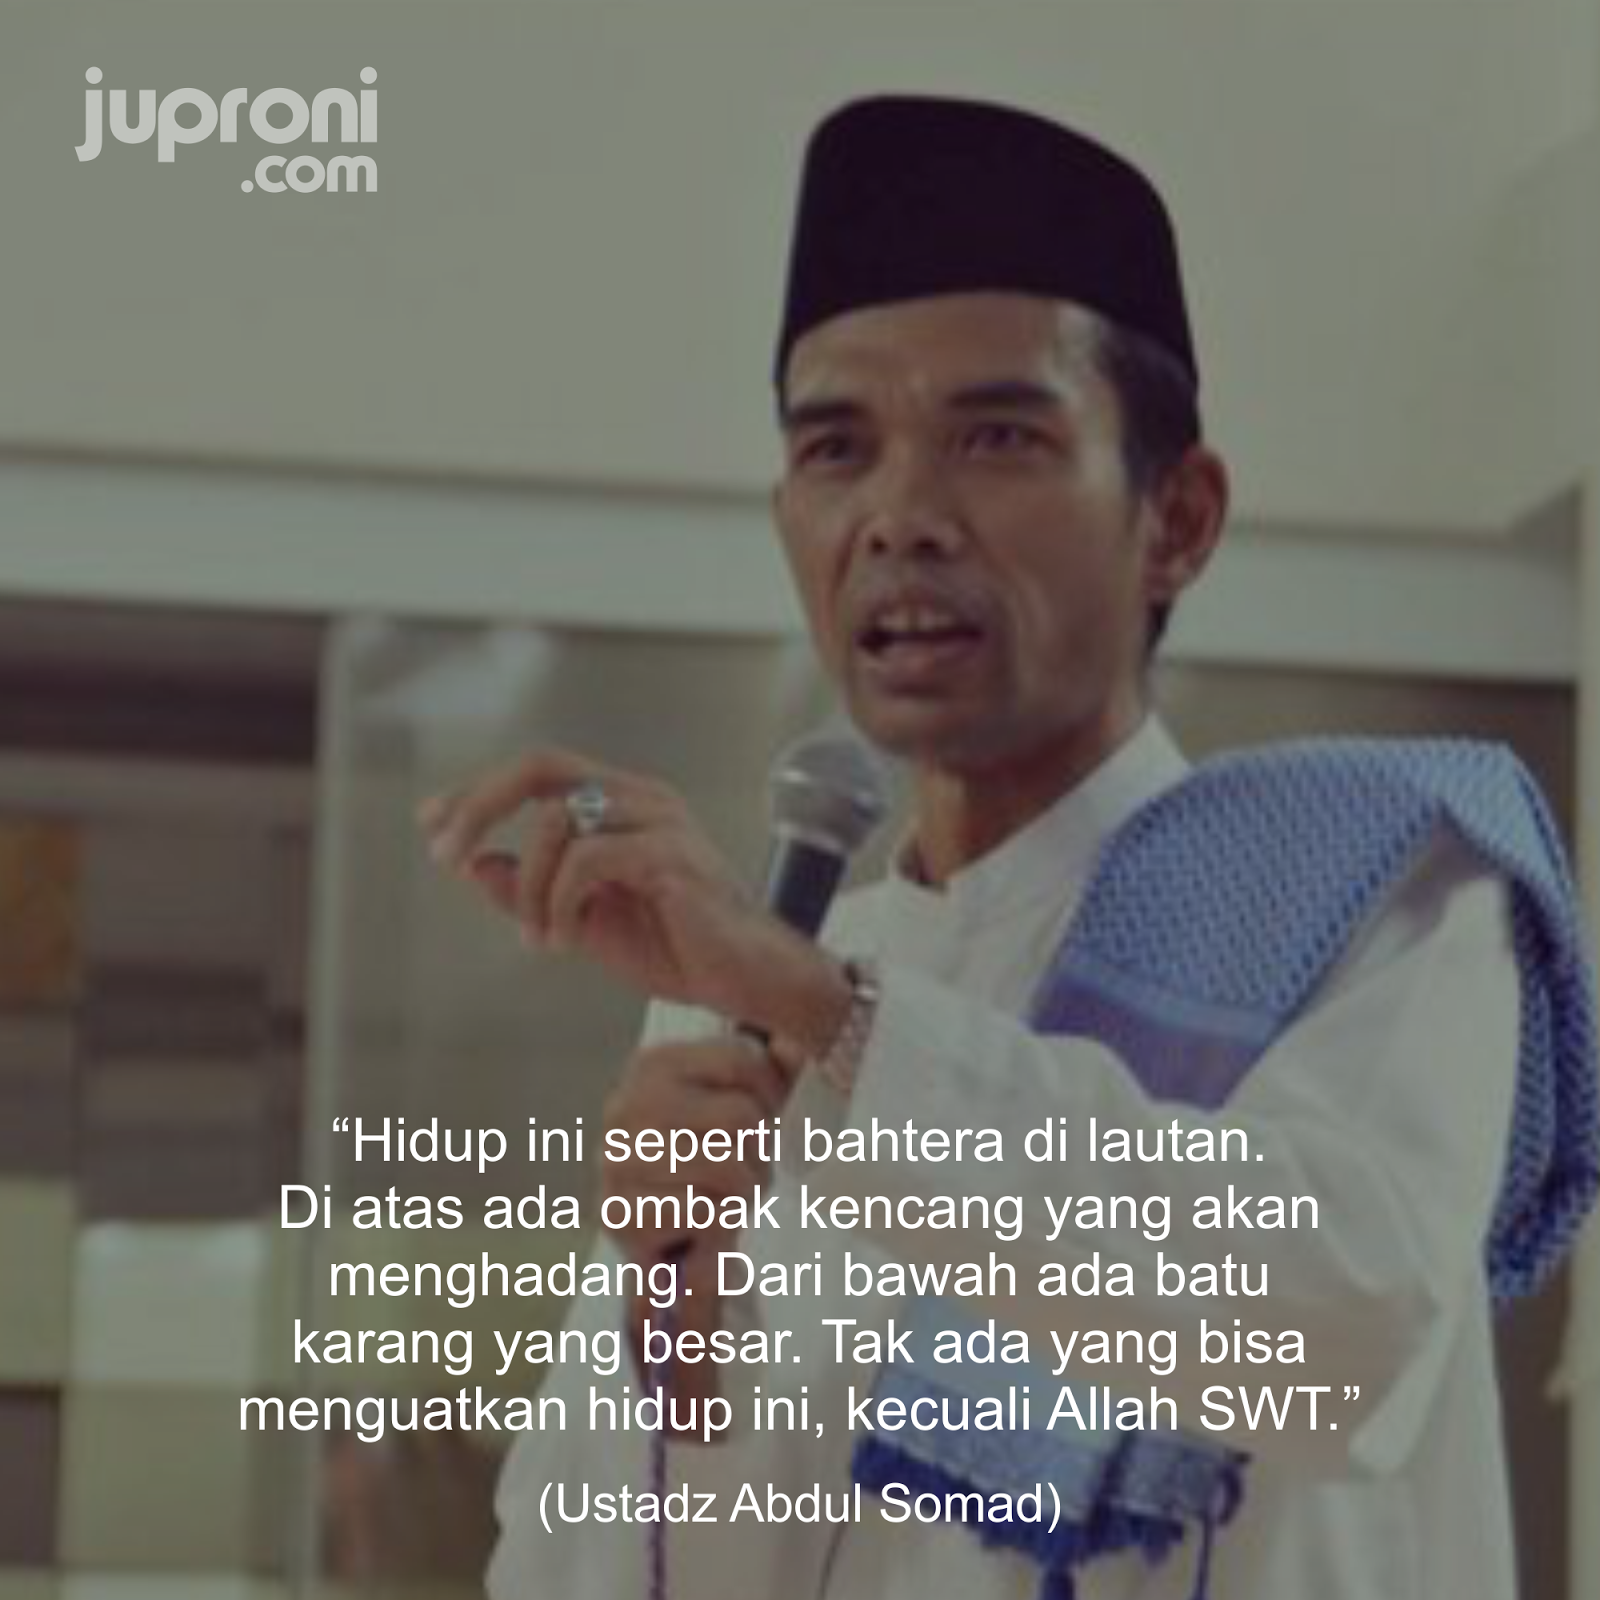 Kata Kata Bijak Ustadz Abdul Somad Juproni Quotes